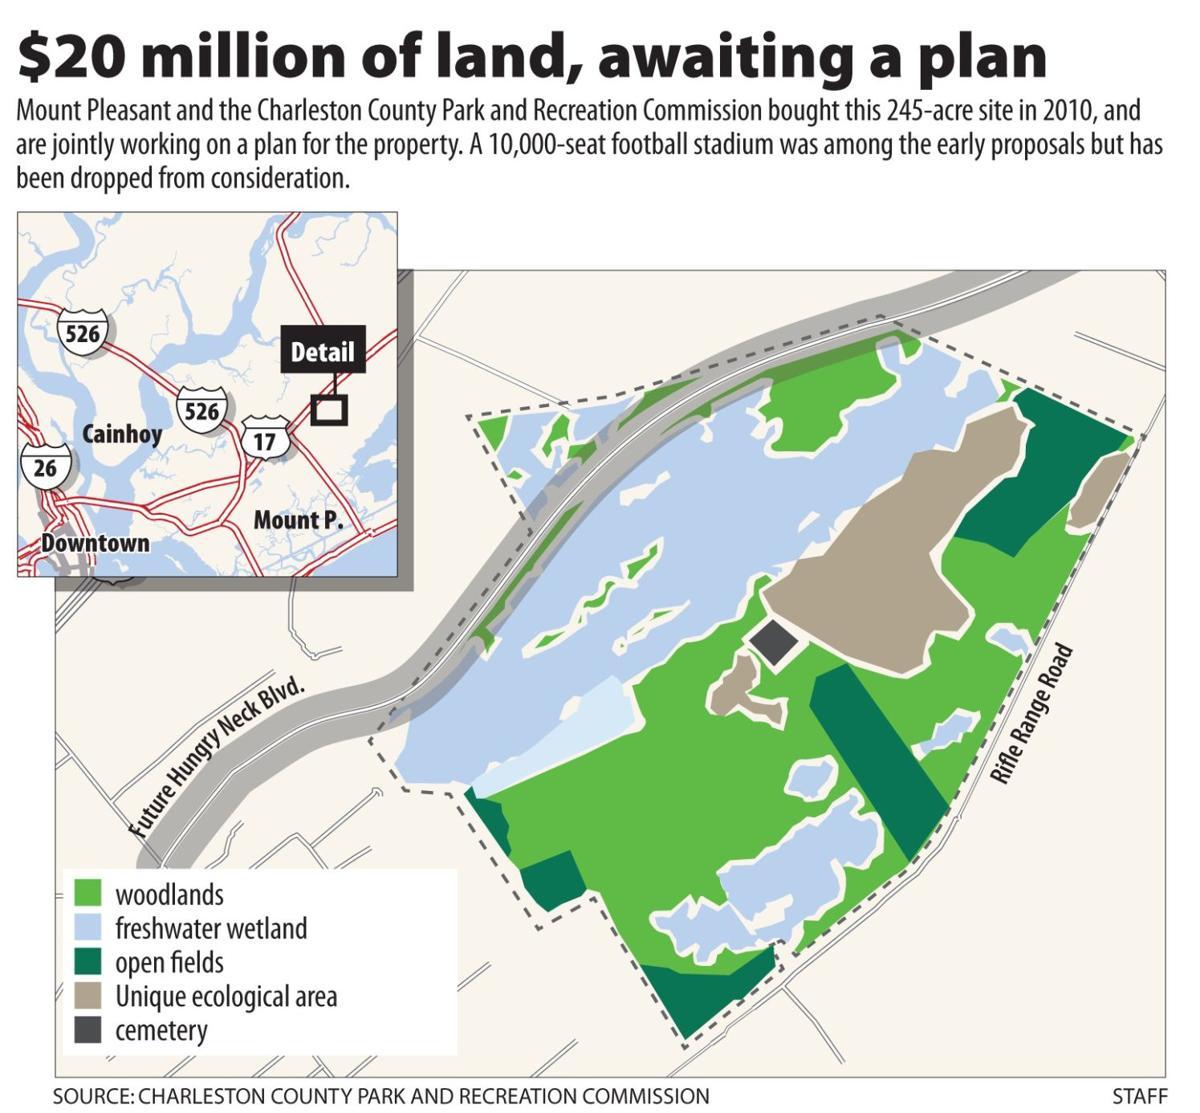 Mount Pleasant park plan proceeds — without football stadium